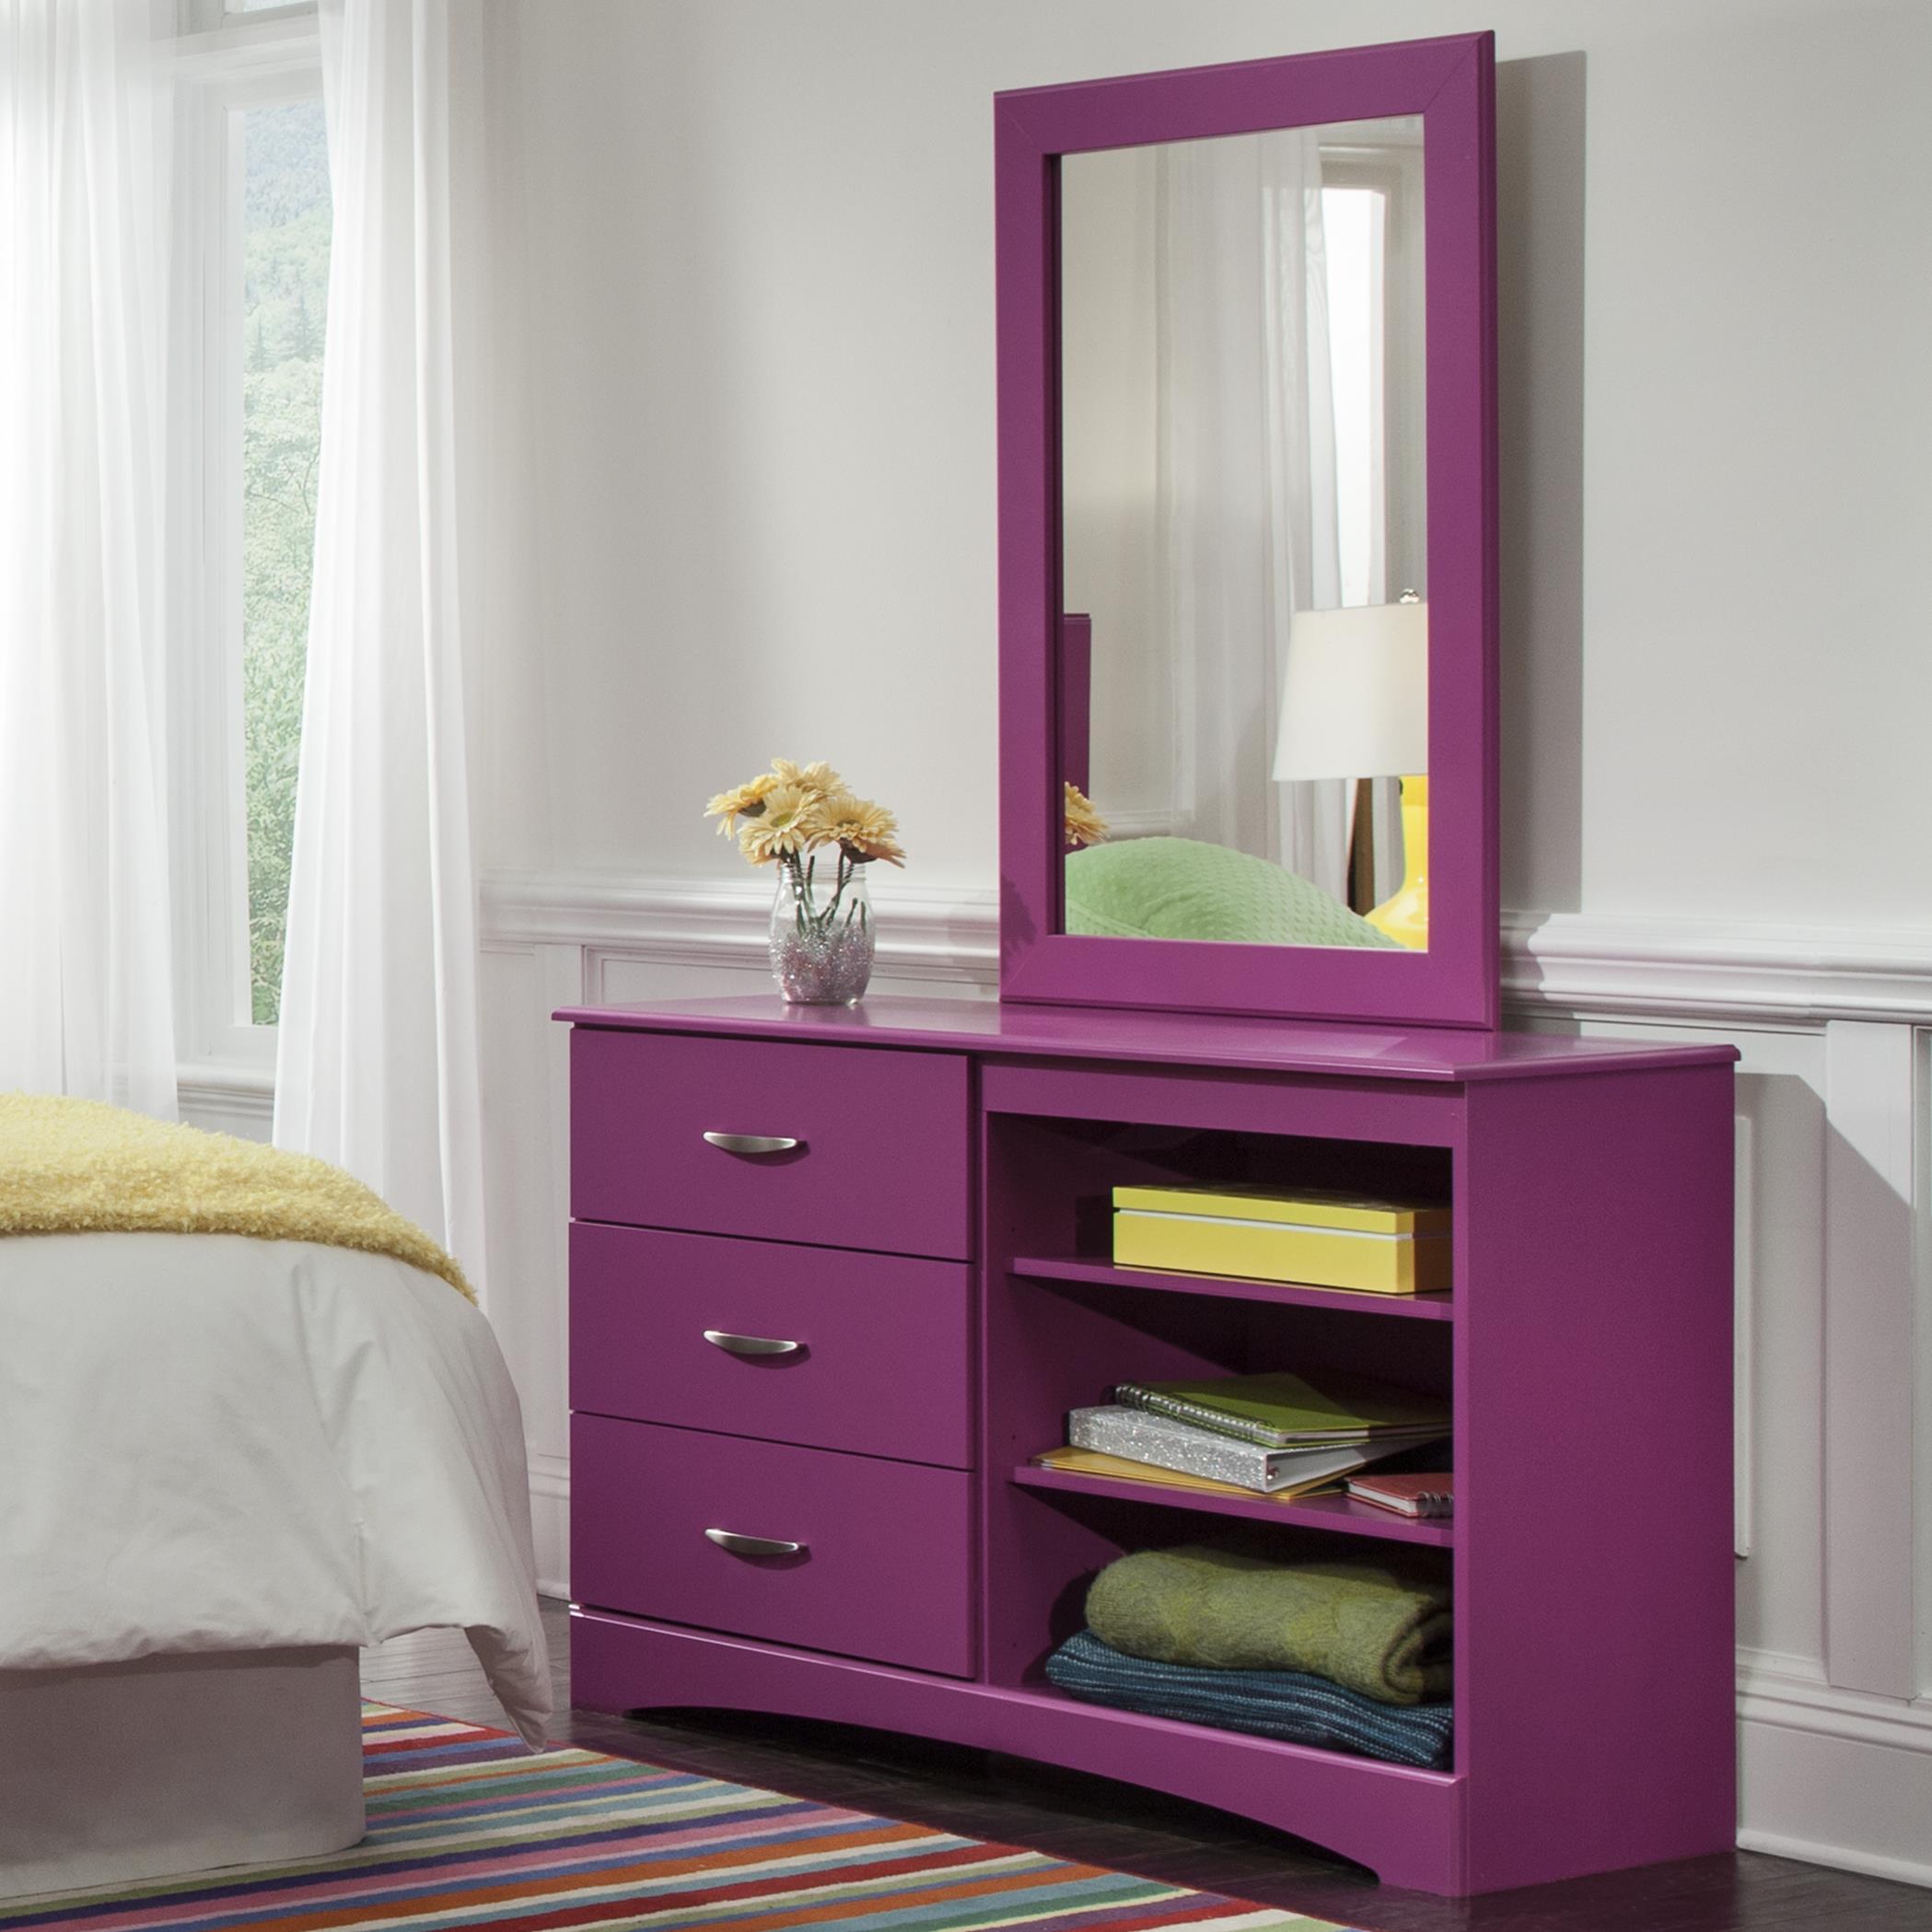 Kith Furniture 171 Raspberry Mirror and Dresser Set - Item Number: 171-01+12